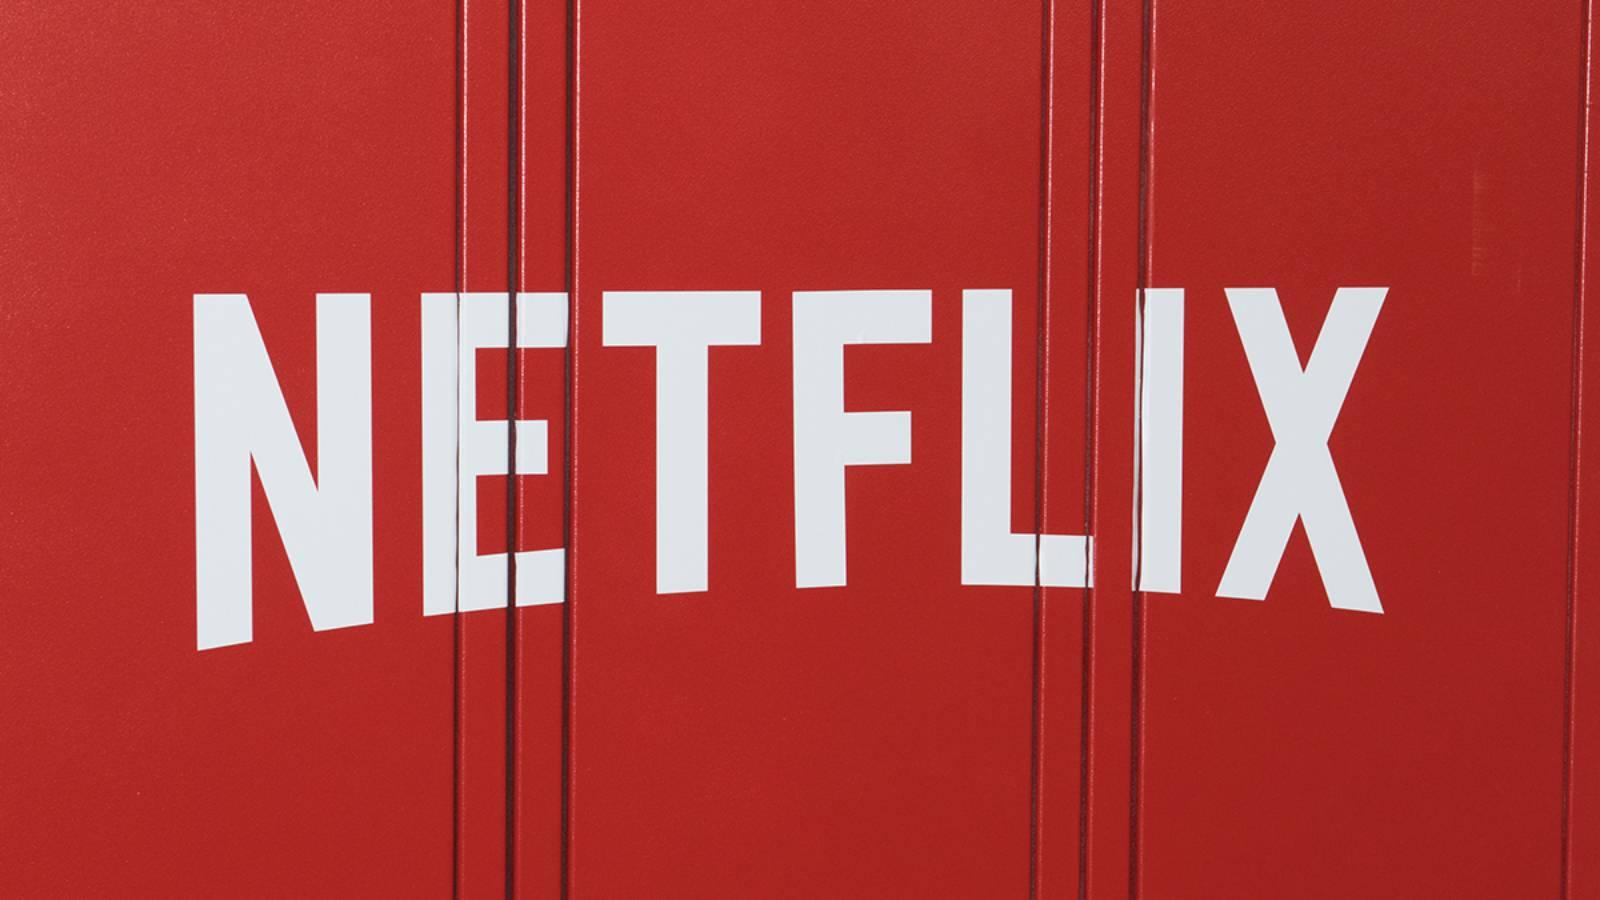 Netflix casuta